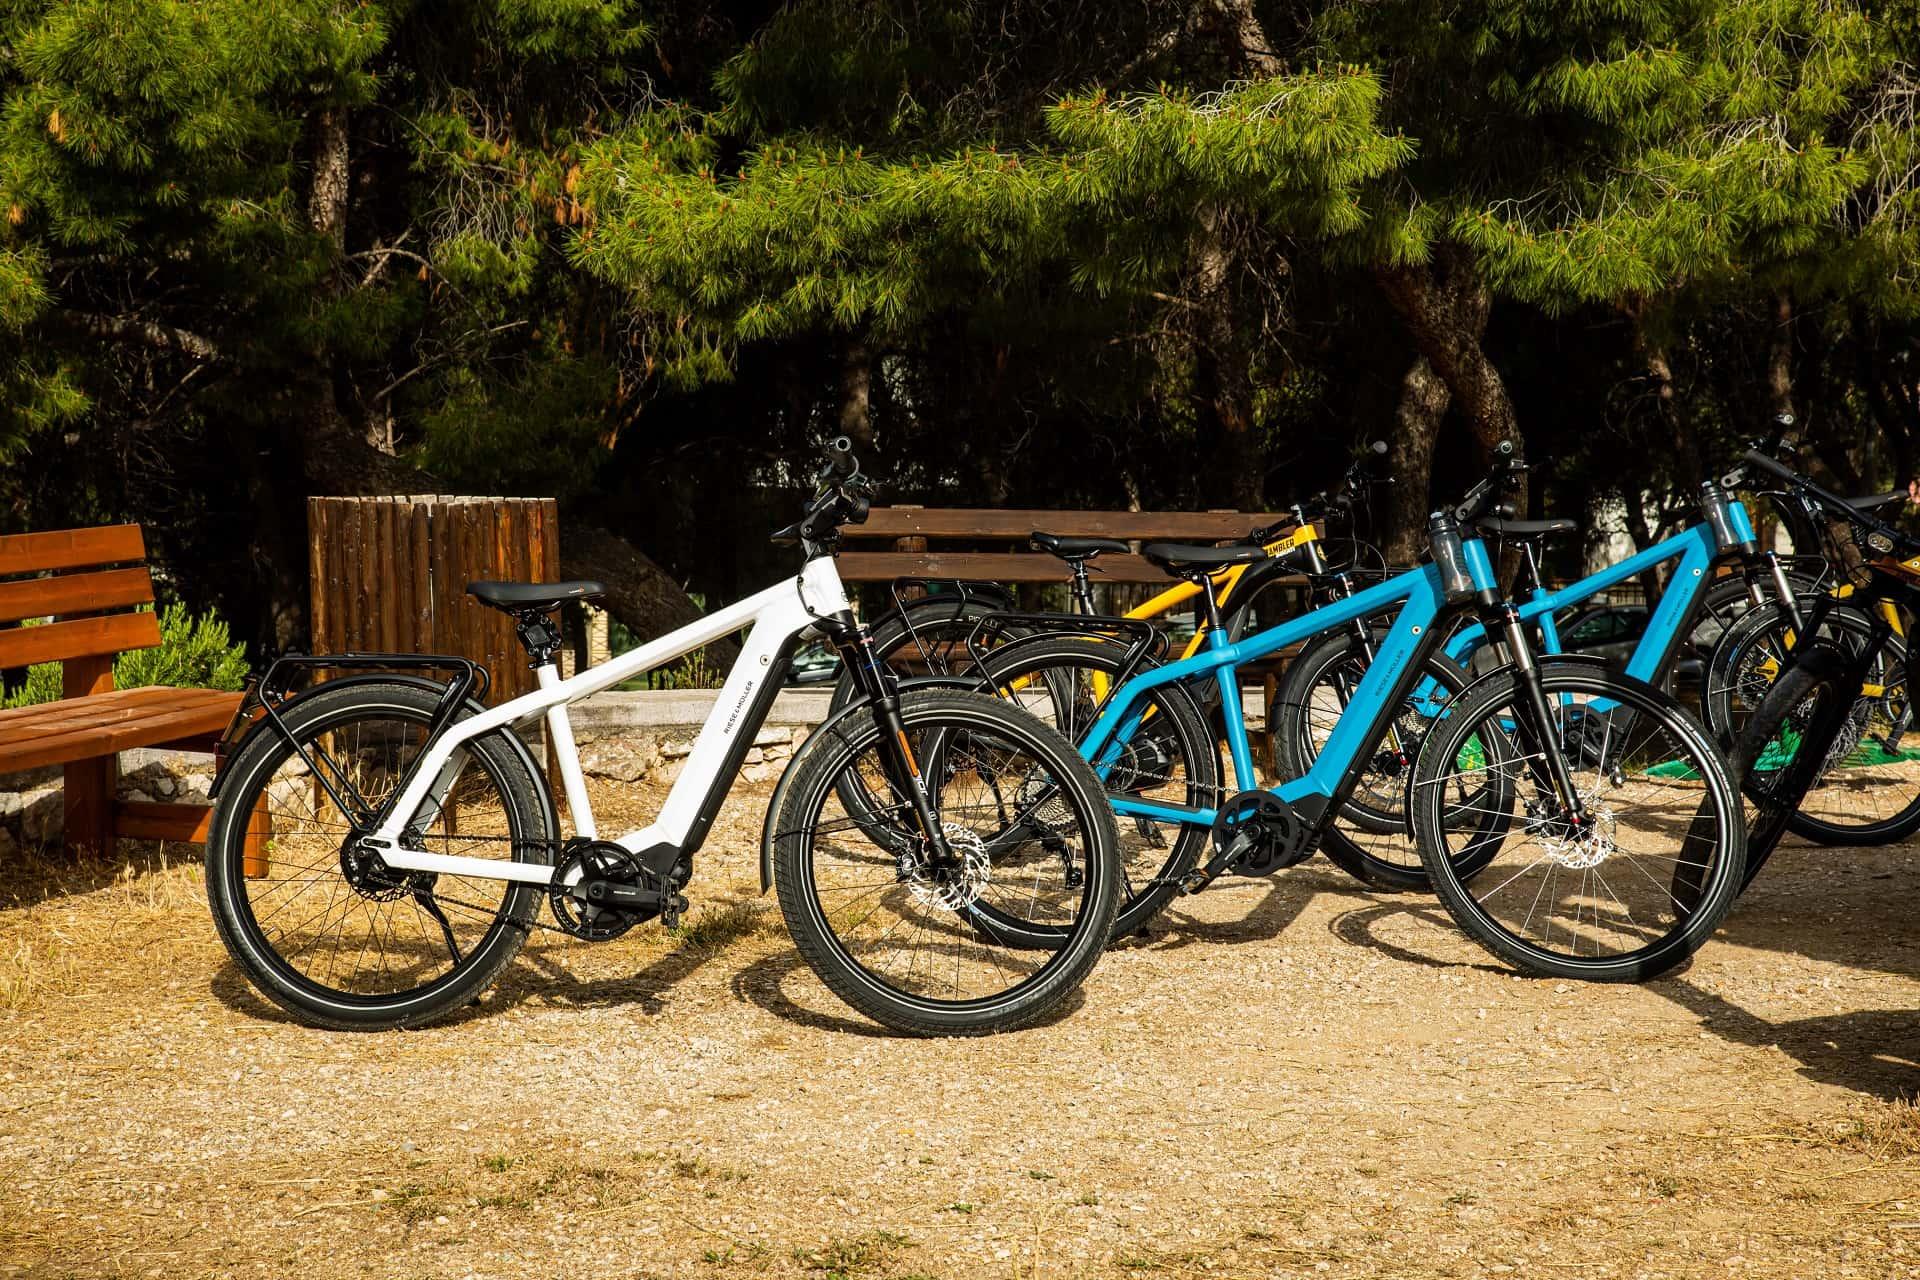 Kosmocar e-bikes στην εκδήλωση για το μνημόνιο συνεργασίας ΥΠΕΝ - ΣΠΑΥ